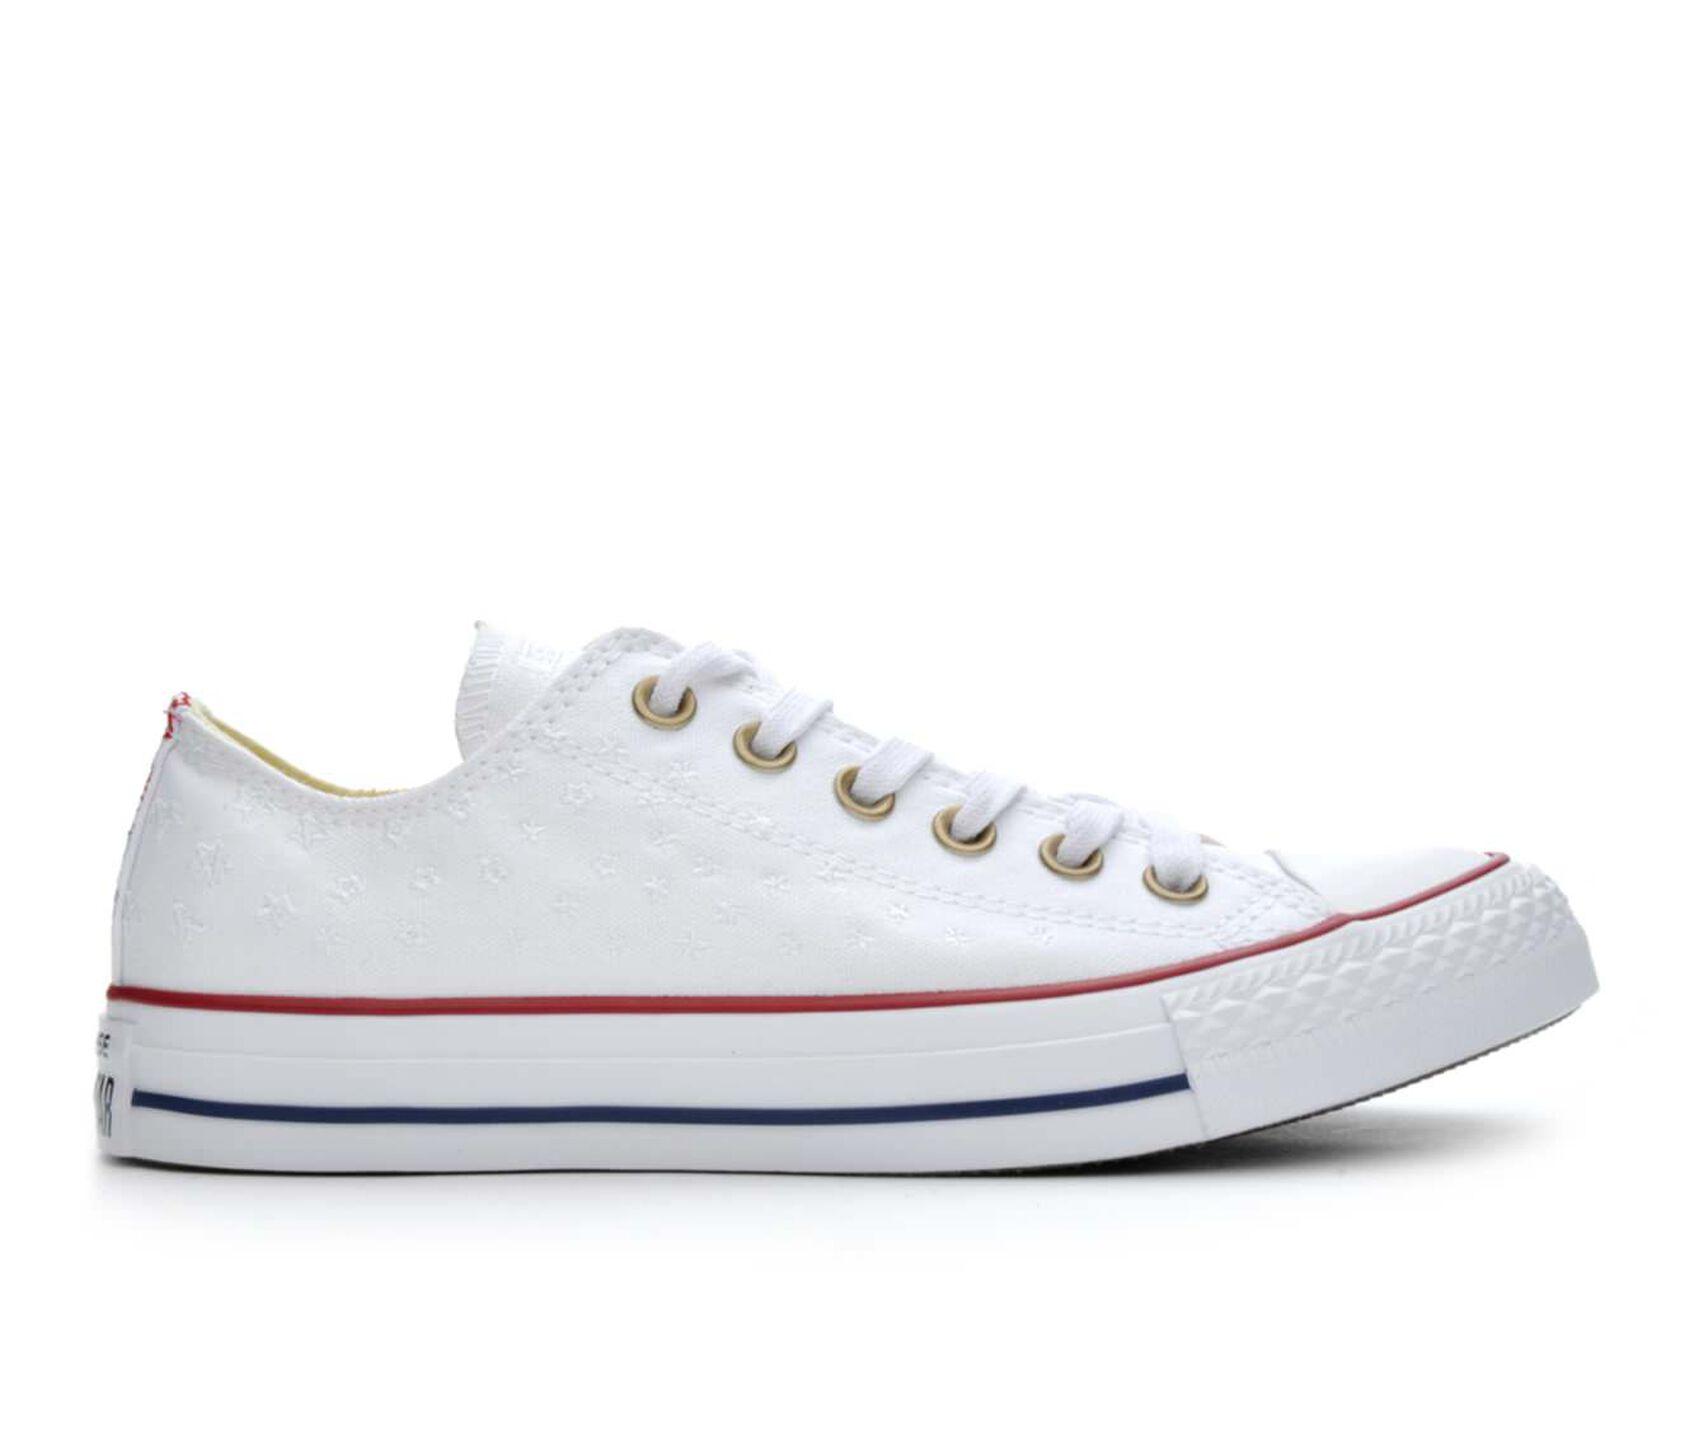 ed5d8622d70 Women s Converse Chuck Taylor All Star Festival Sneakers